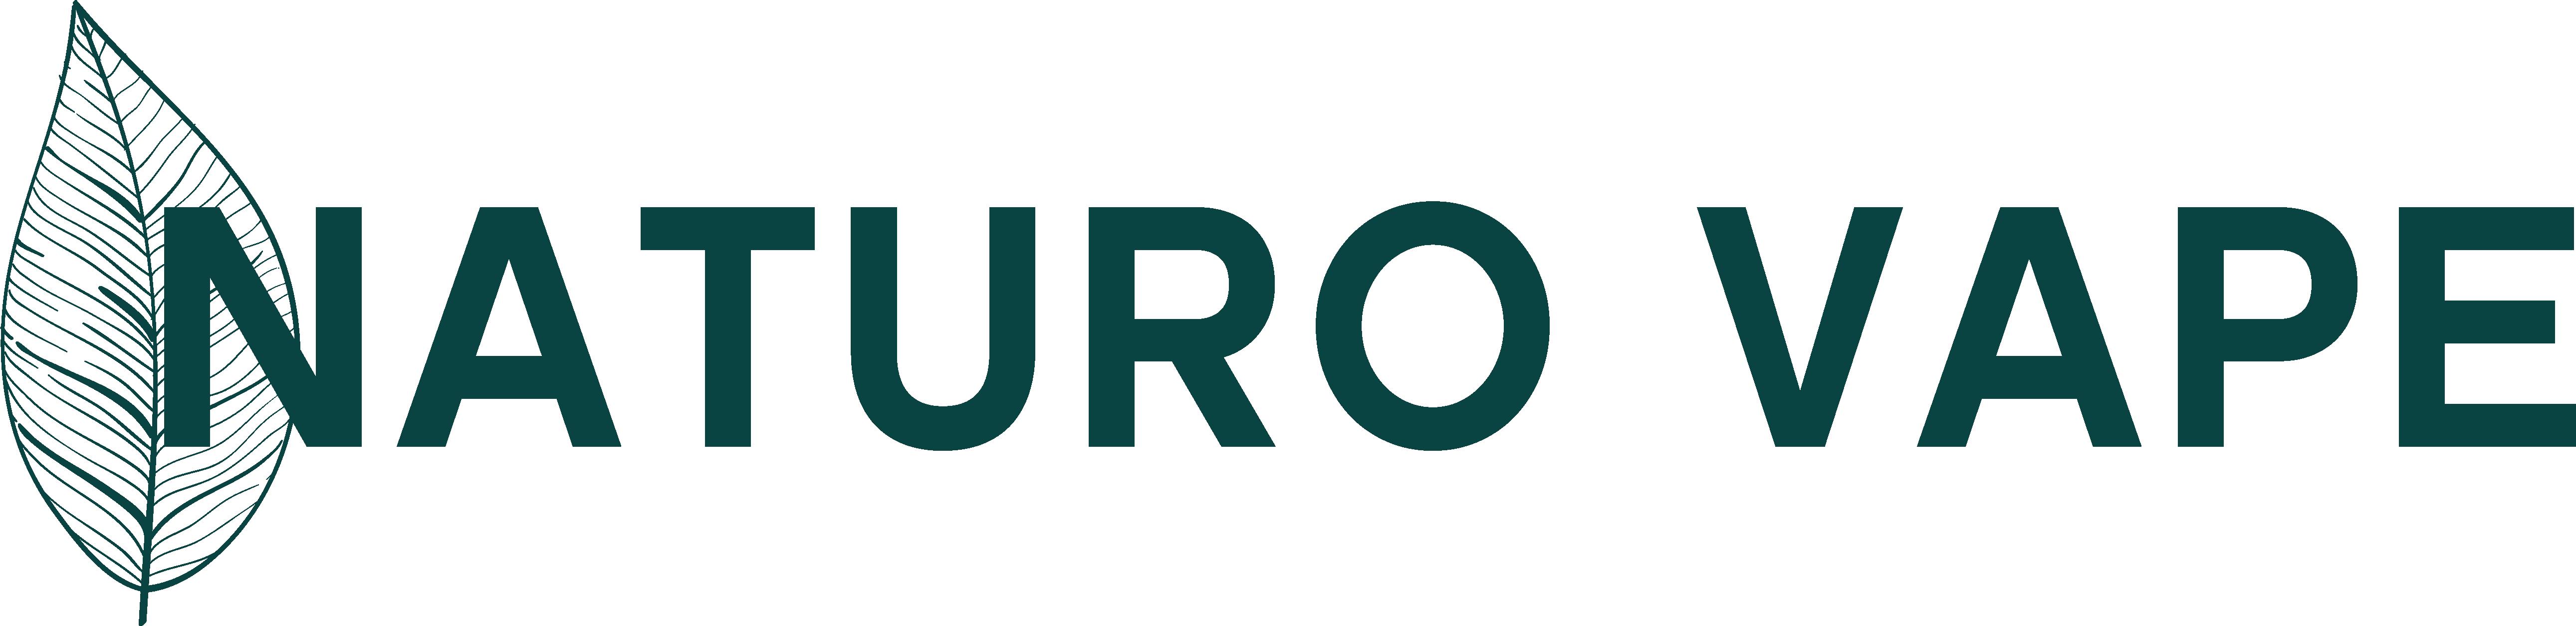 Naturo Vape Logo